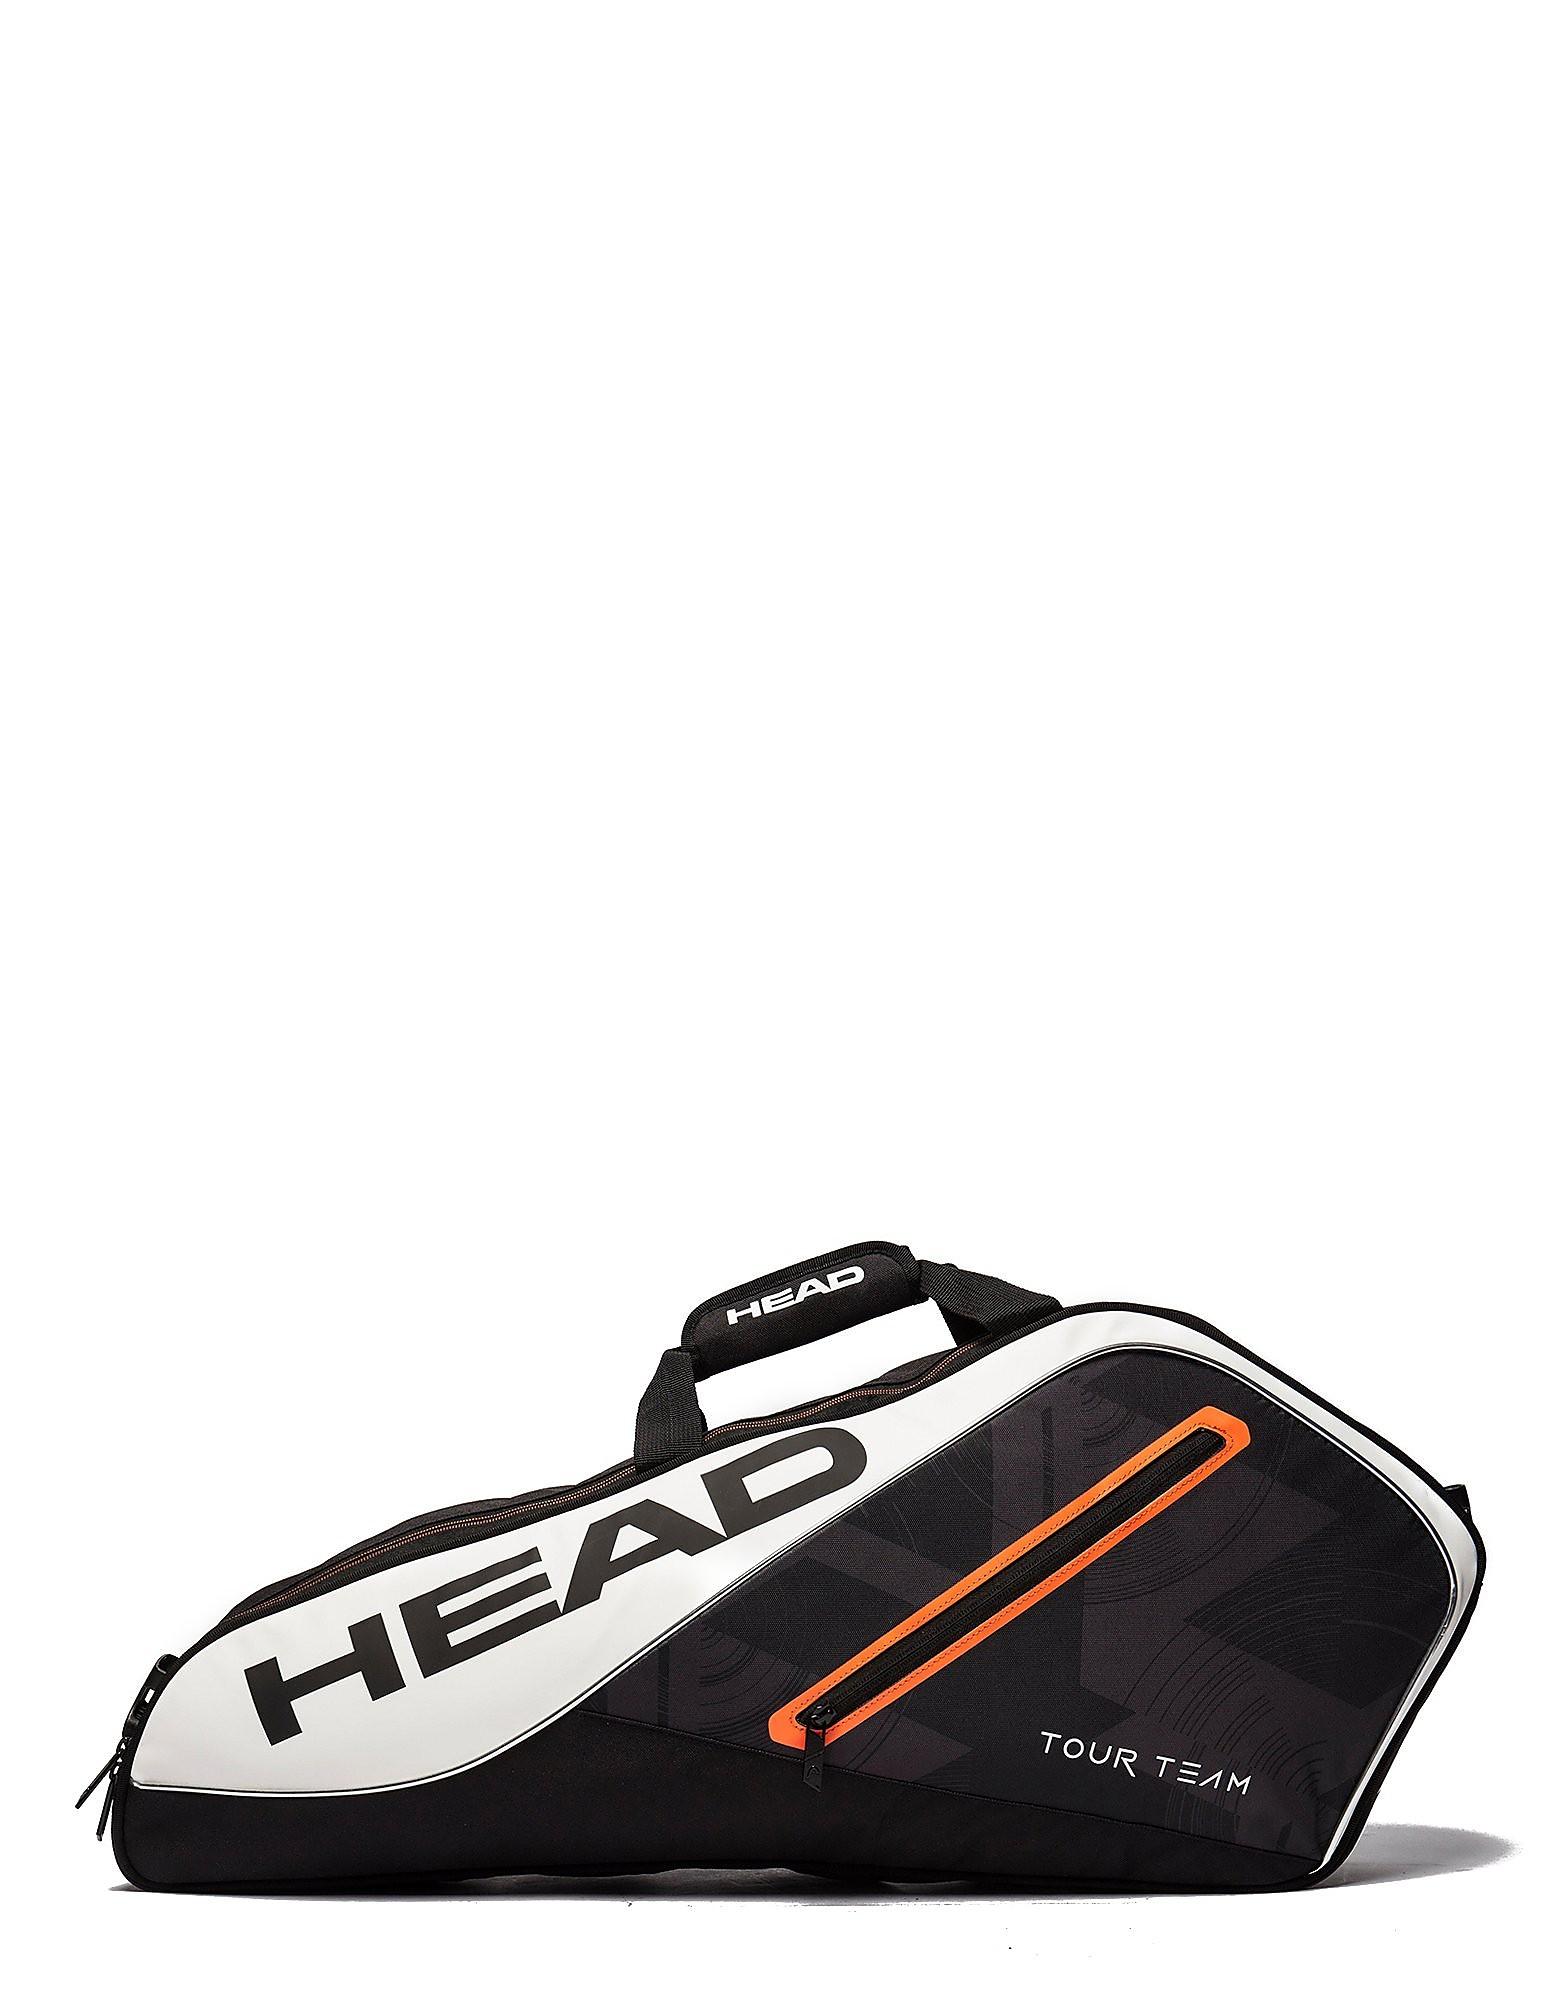 Head Tour Team 3R Pro Racket Bag